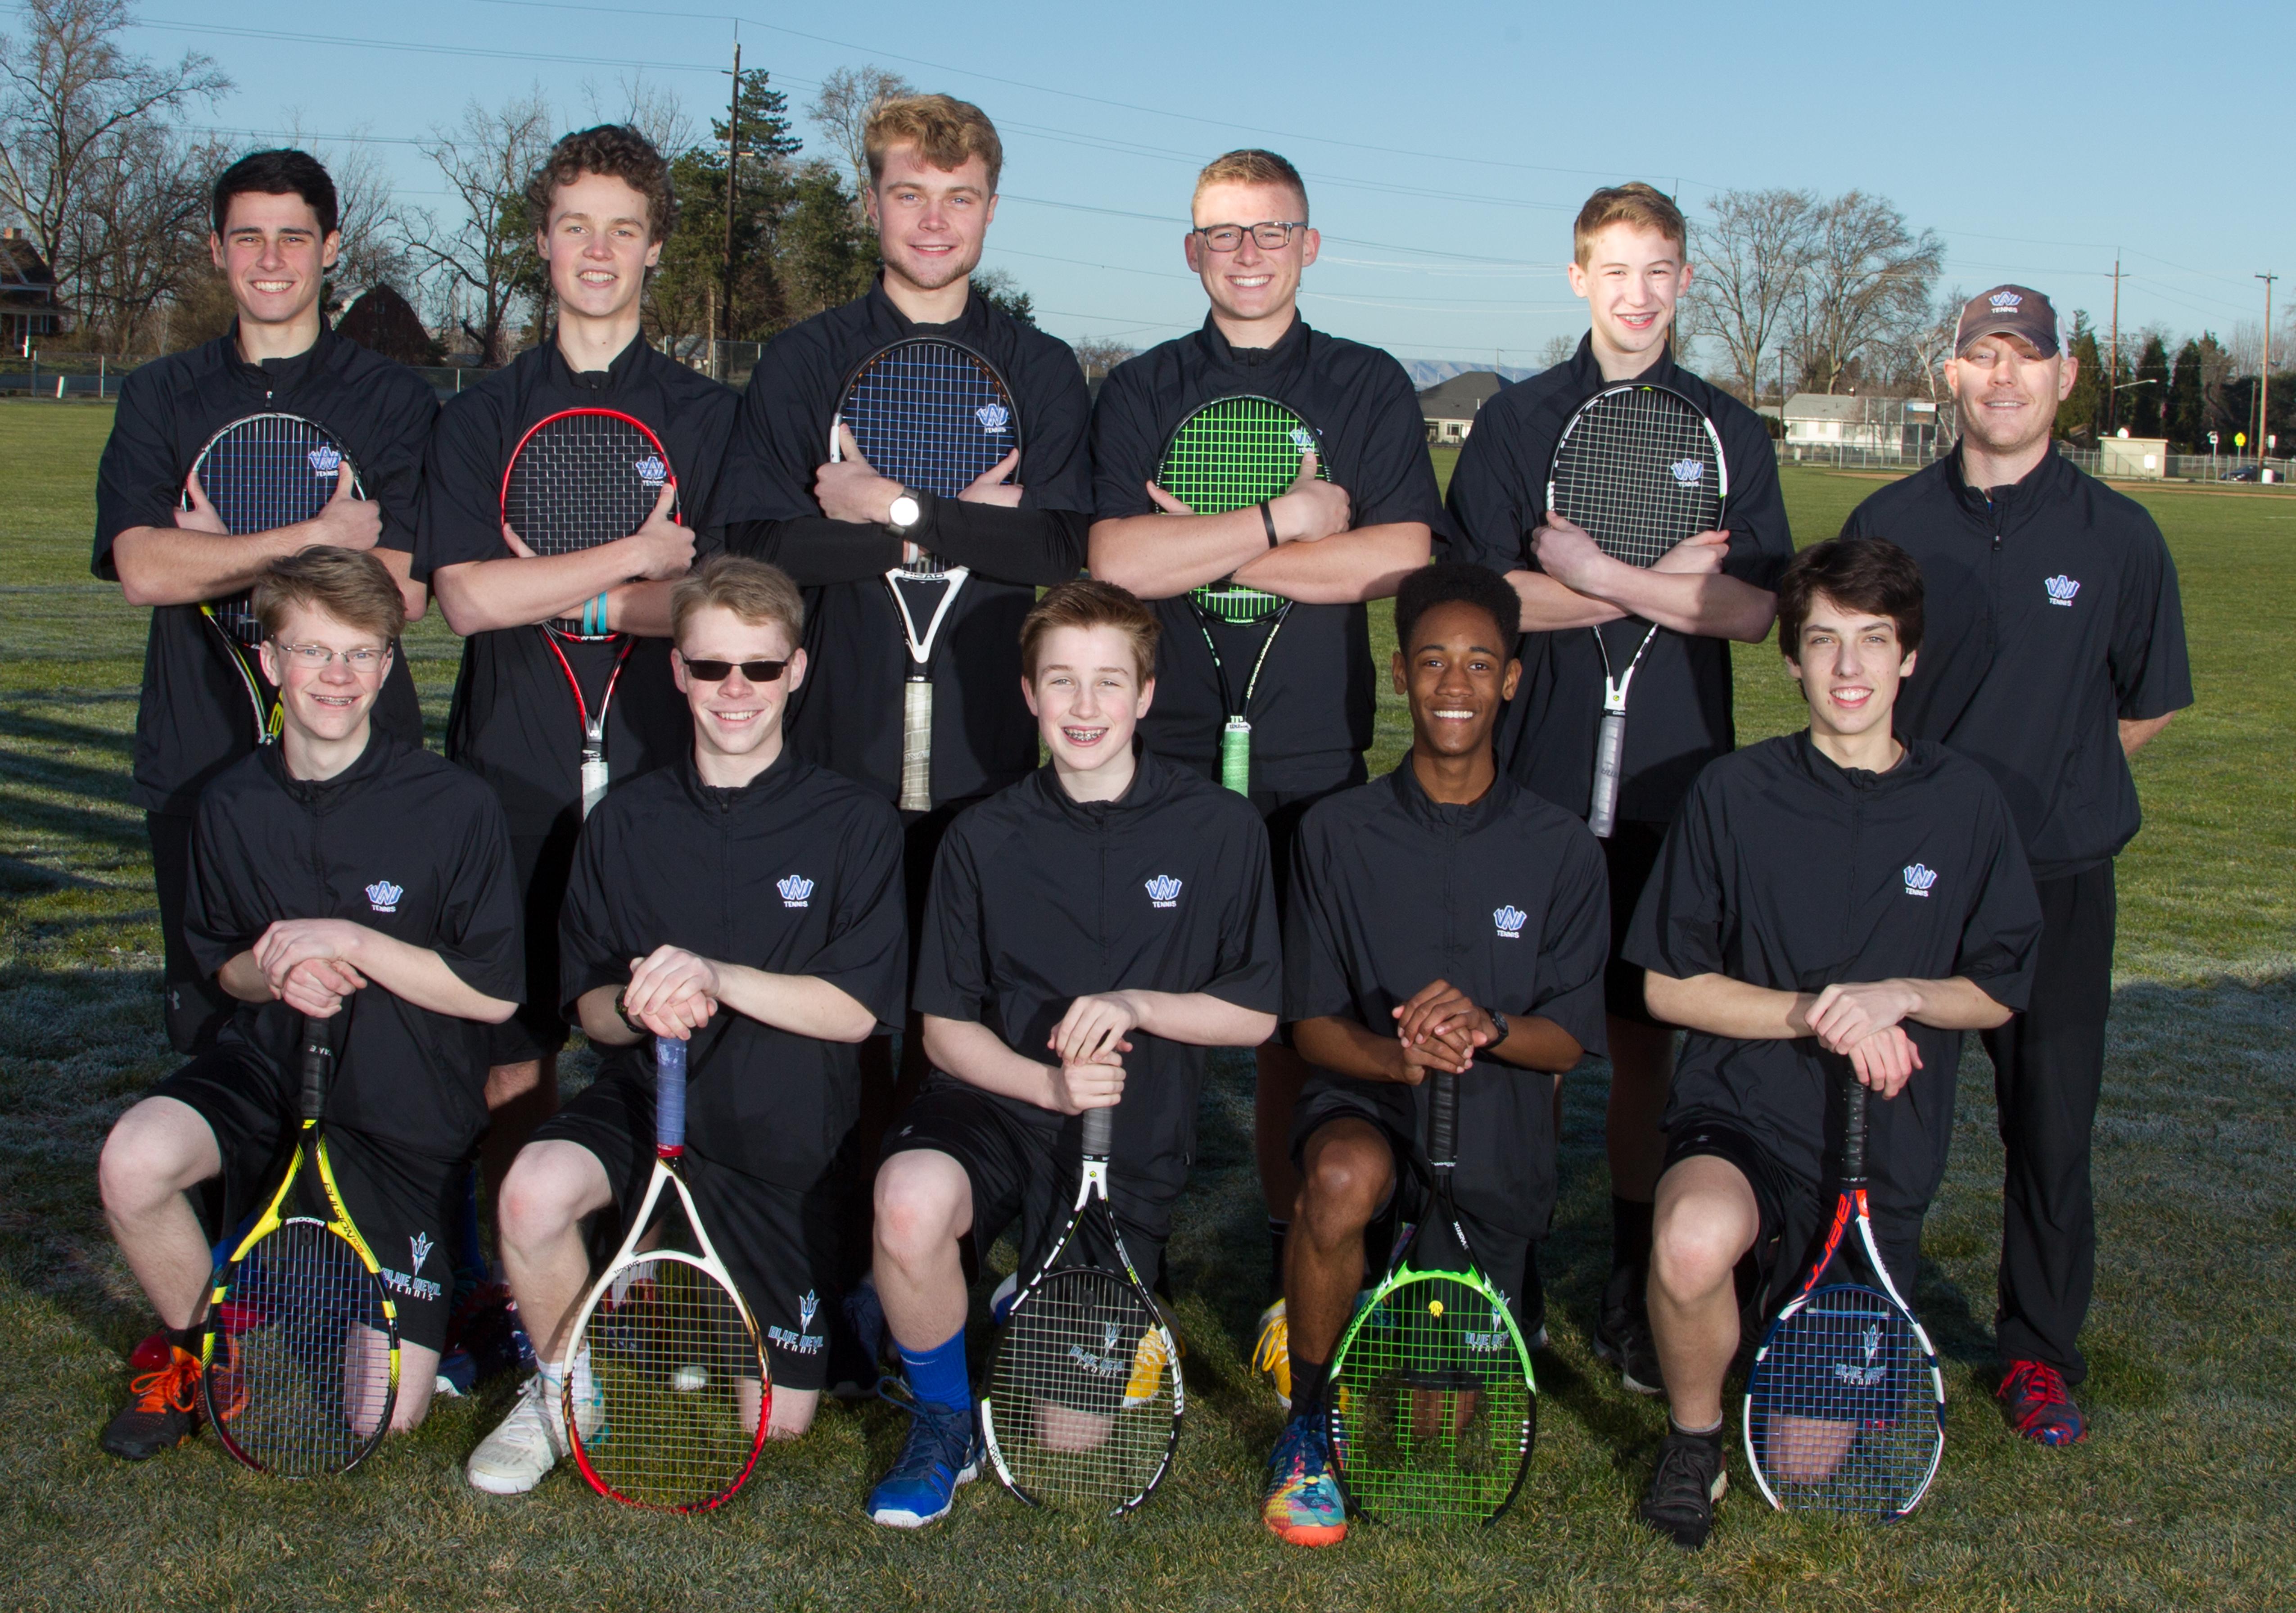 images/athletics/Tennis/2018_Boys_Tennis_Varsity.jpg